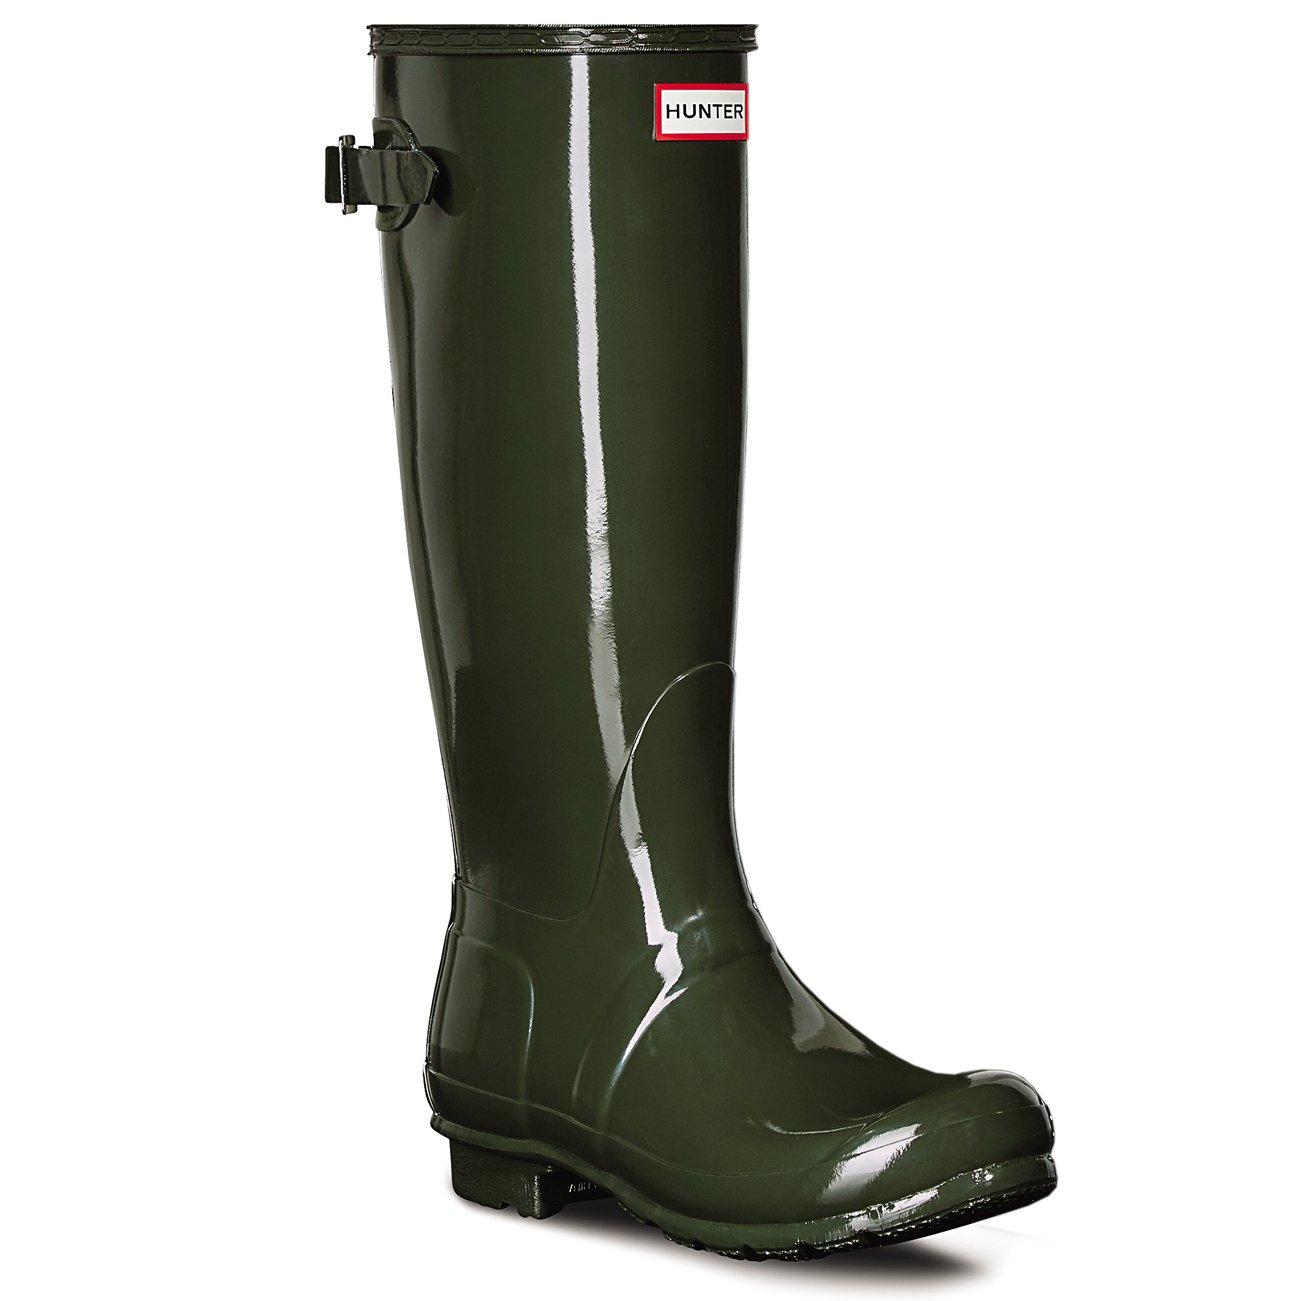 Hunter Womens Original Adjustable Back Gloss Waterproof Winter Rain Boot - Dark Olive - 9